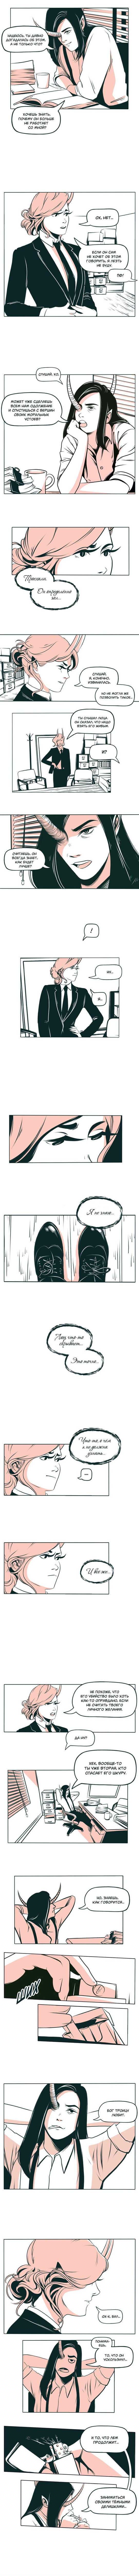 https://r1.ninemanga.com/comics/pic2/0/33536/420929/1534437825830.jpg Page 3